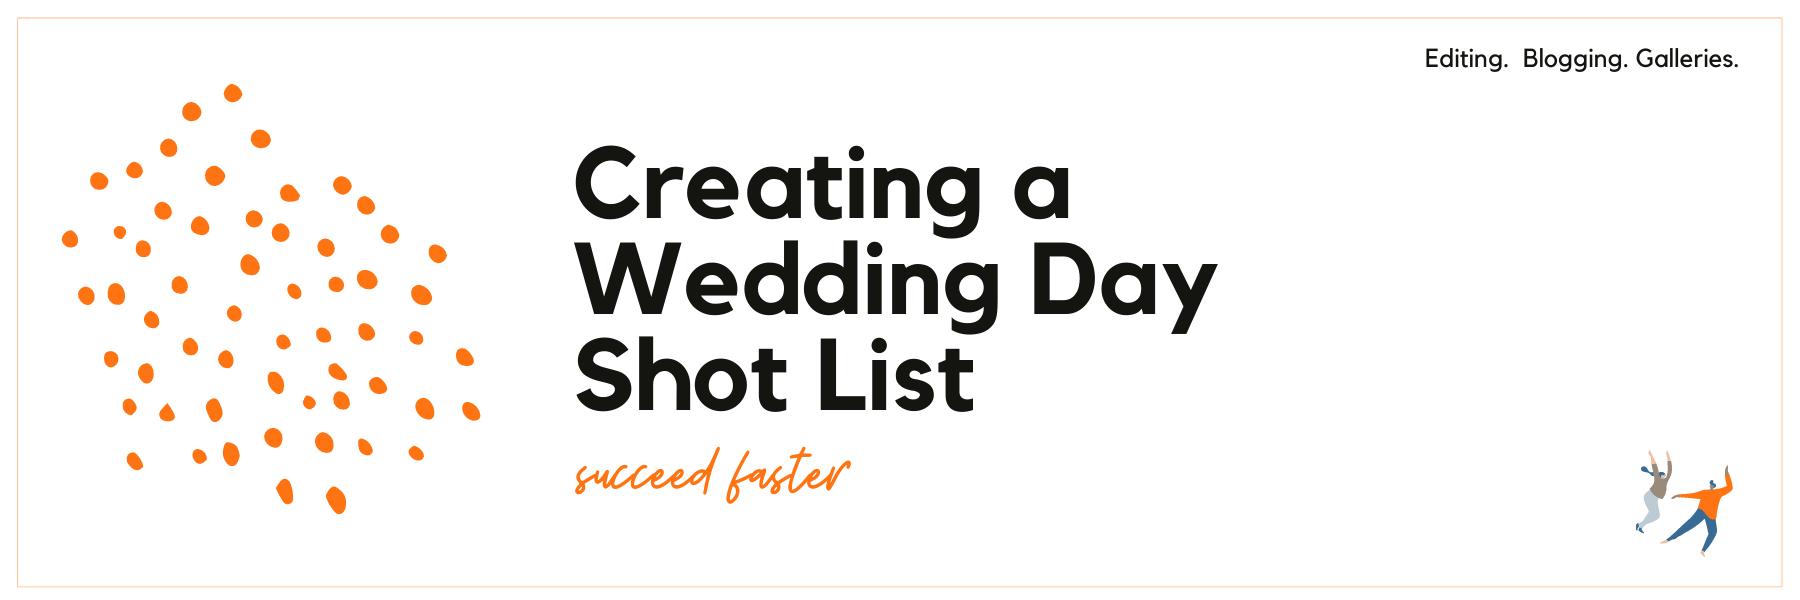 Creating a Wedding Day Shot List